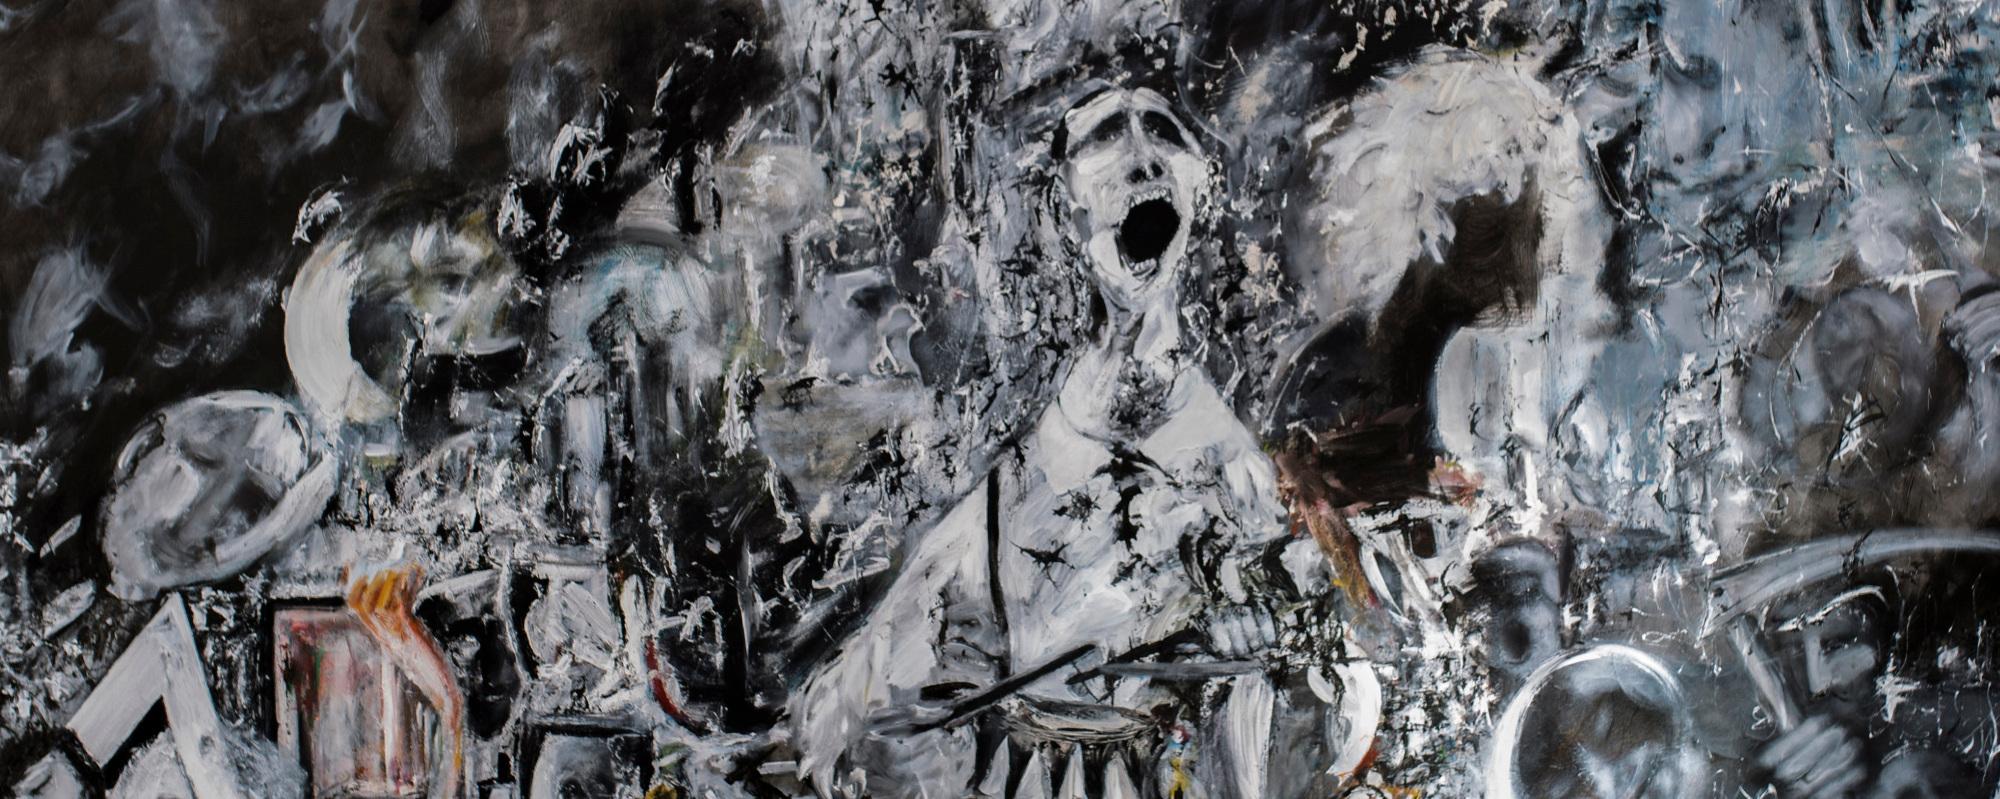 Miro Niklewicz: Die Nacht